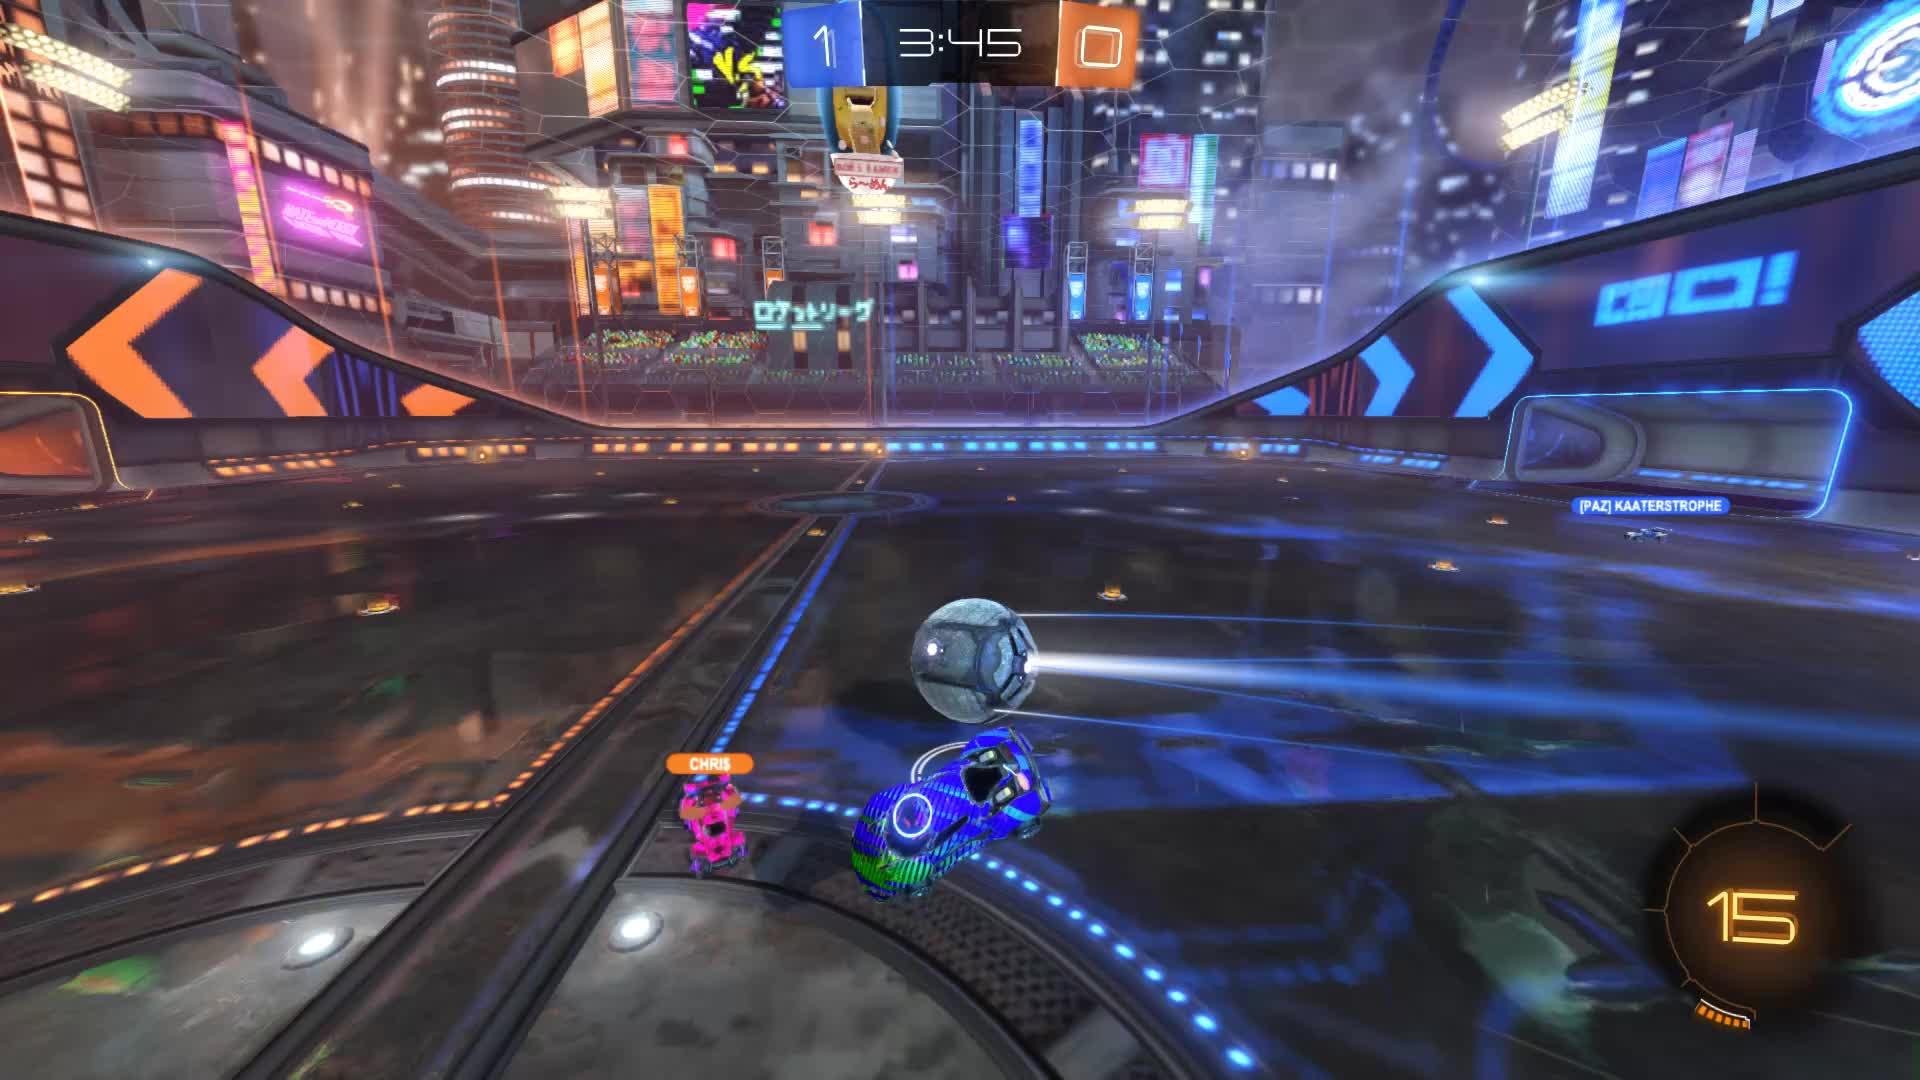 Gif Your Game, GifYourGame, Rocket League, RocketLeague, [PaZ]_galxii, [PaZ]_galxii Clip 1 GIFs